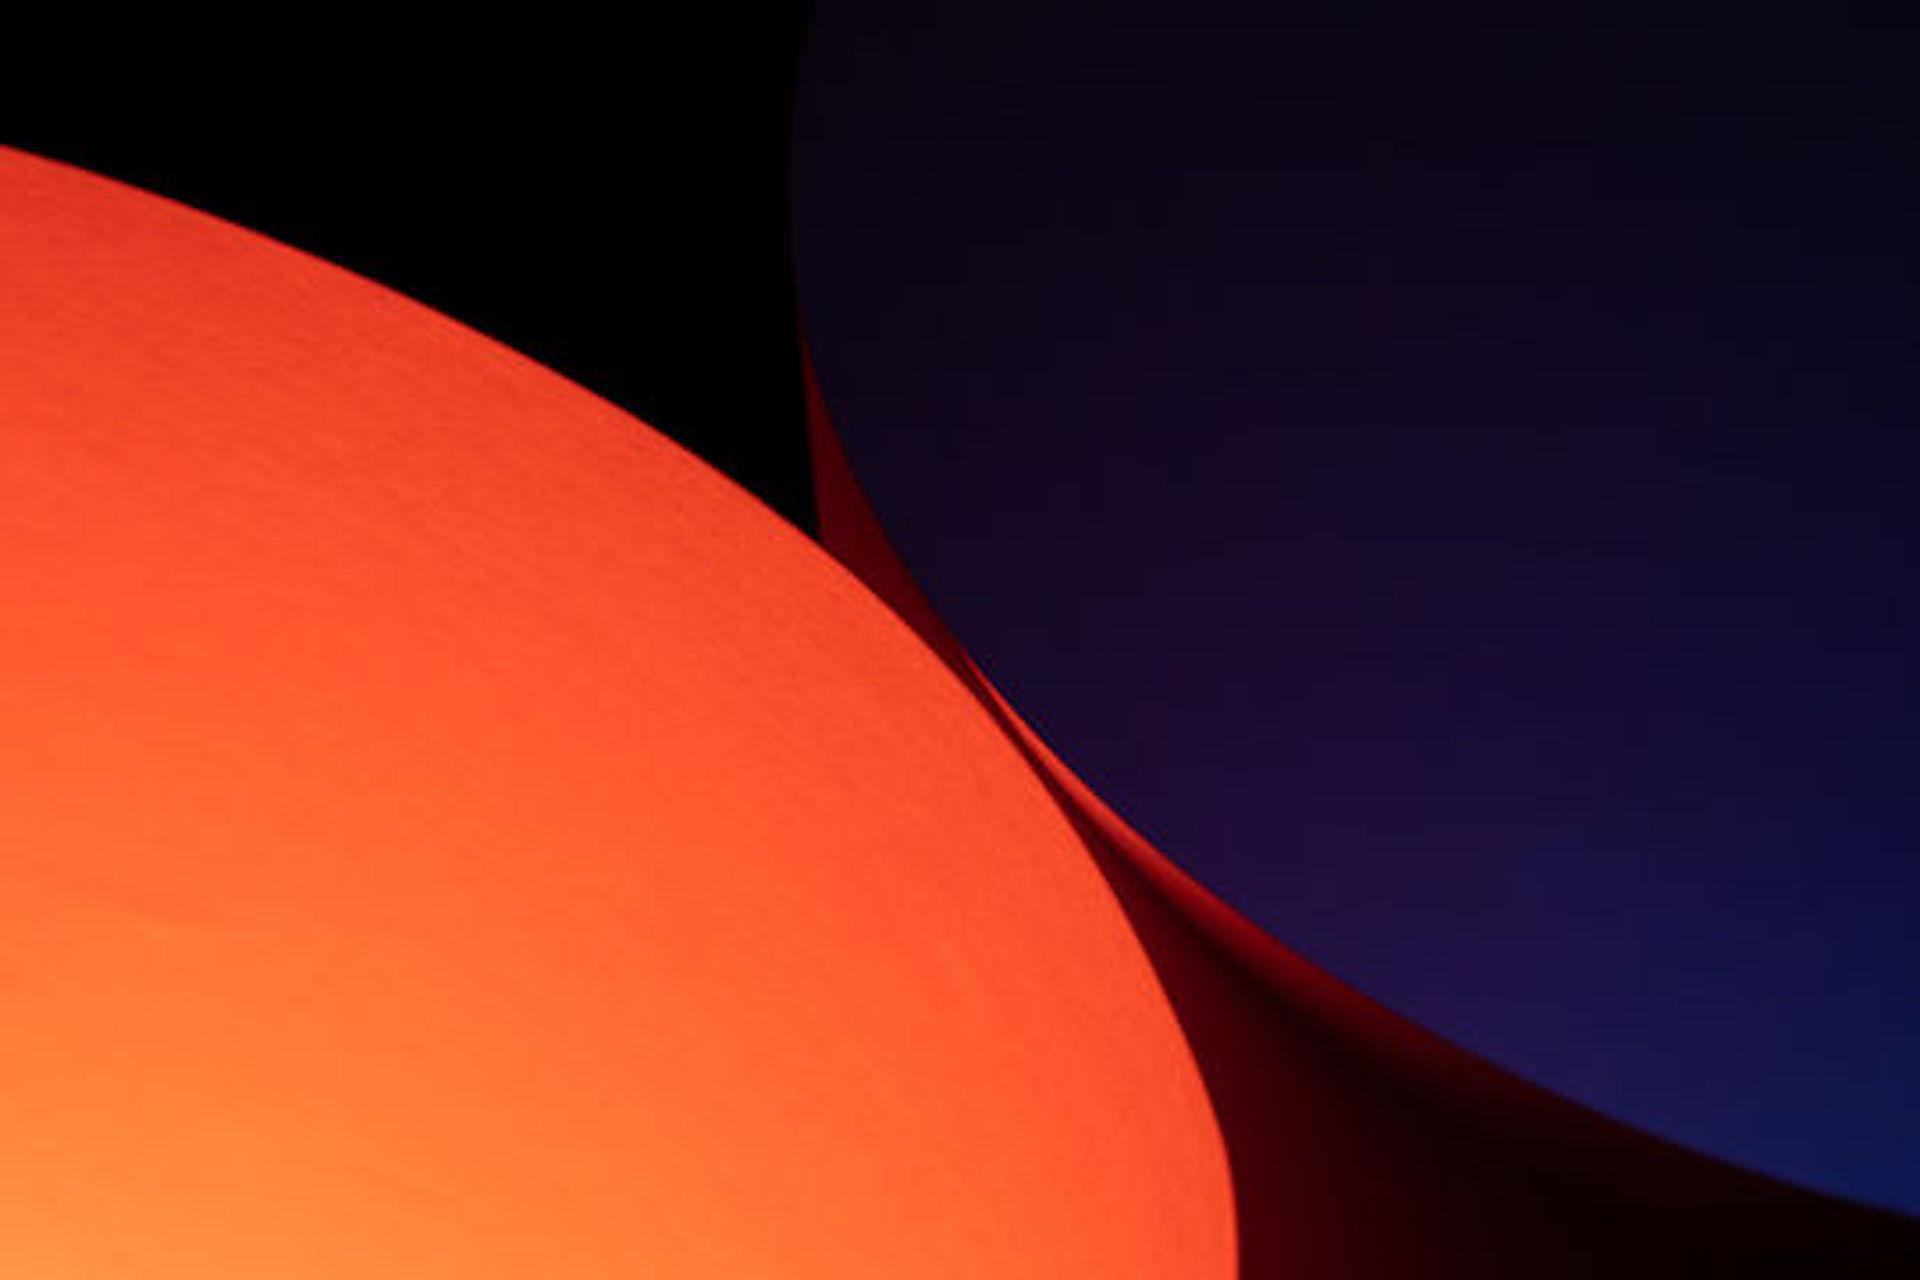 Blue x Orange example photo